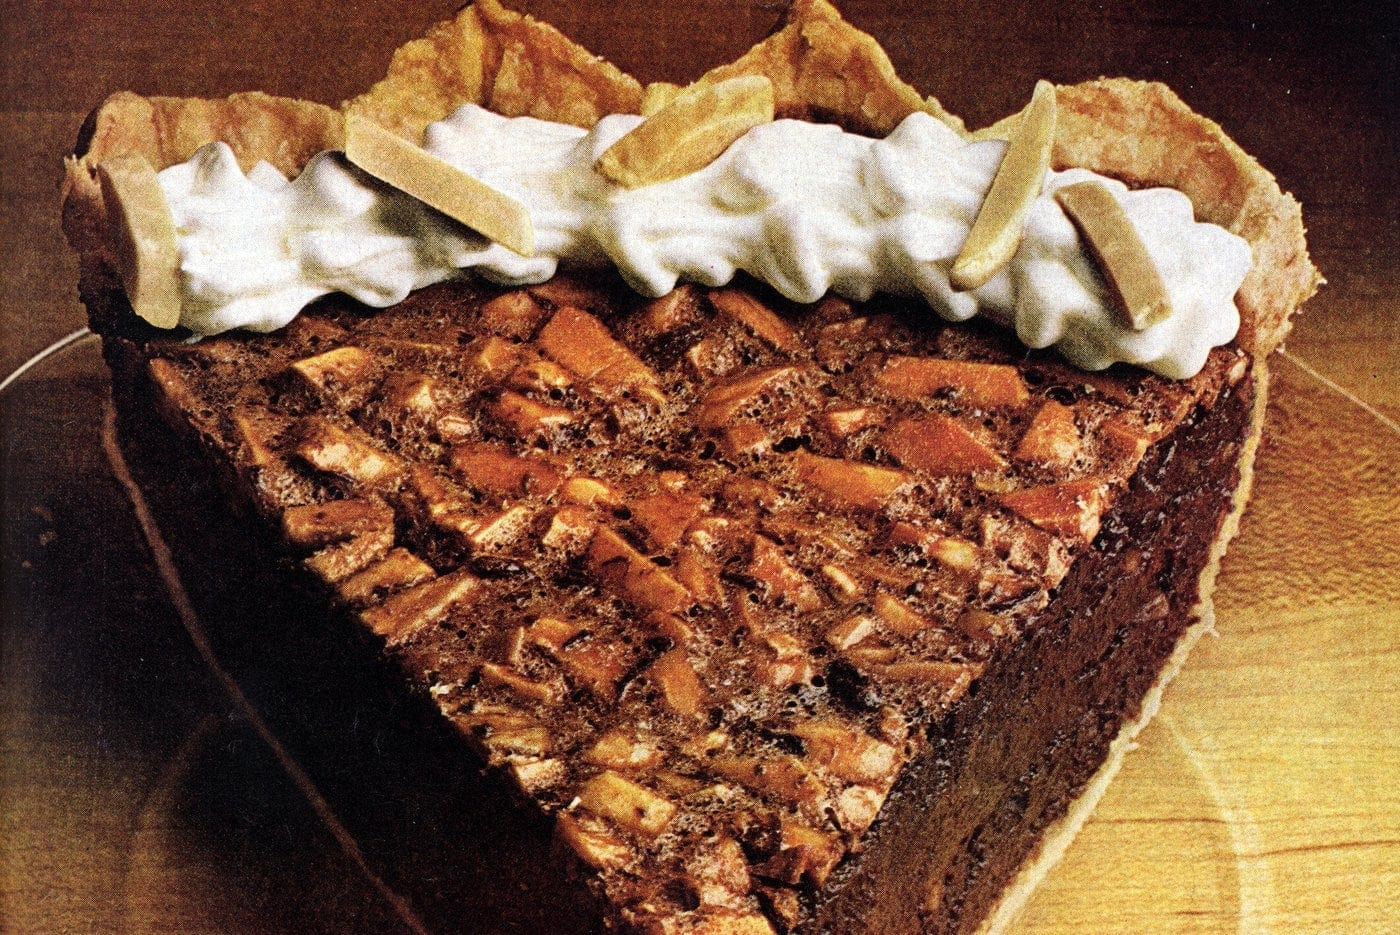 Velvet almond fudge pie (1978)